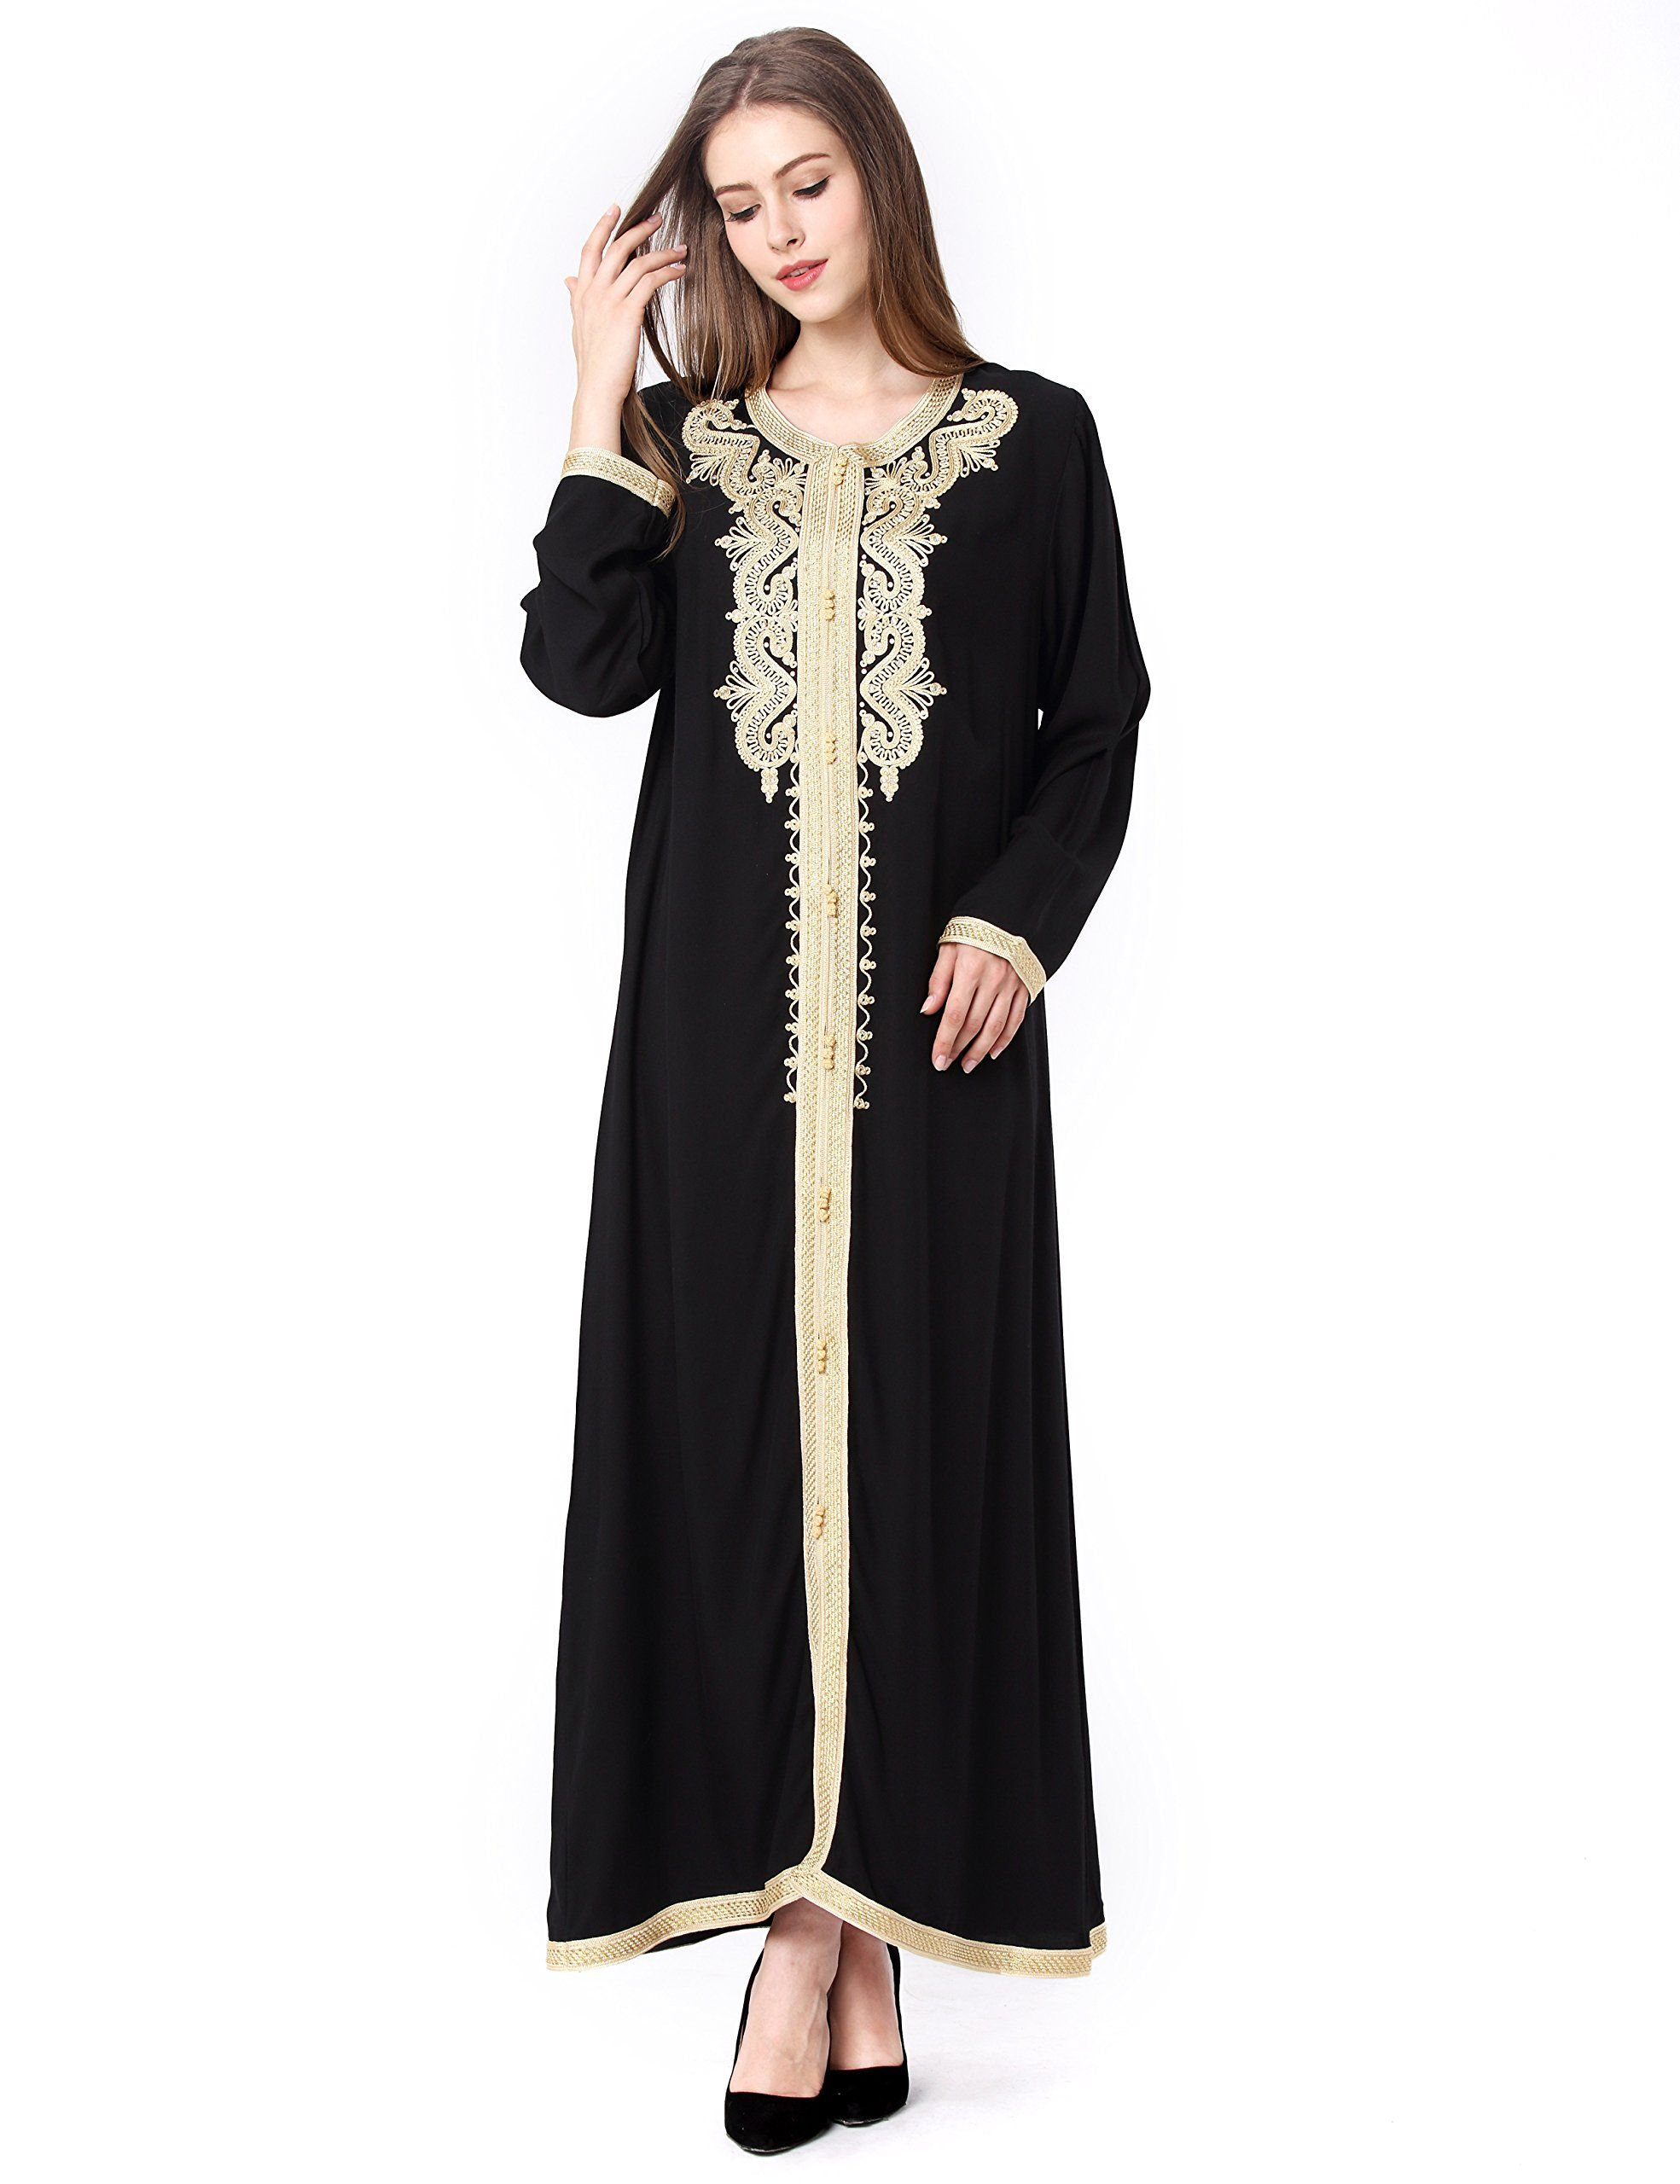 Muslim Dress Dubai Kaftan Women Long Sleeve Arabic Long Dress Abaya Islamic Clothing Girls Jalabiya Caftan Formal Gown